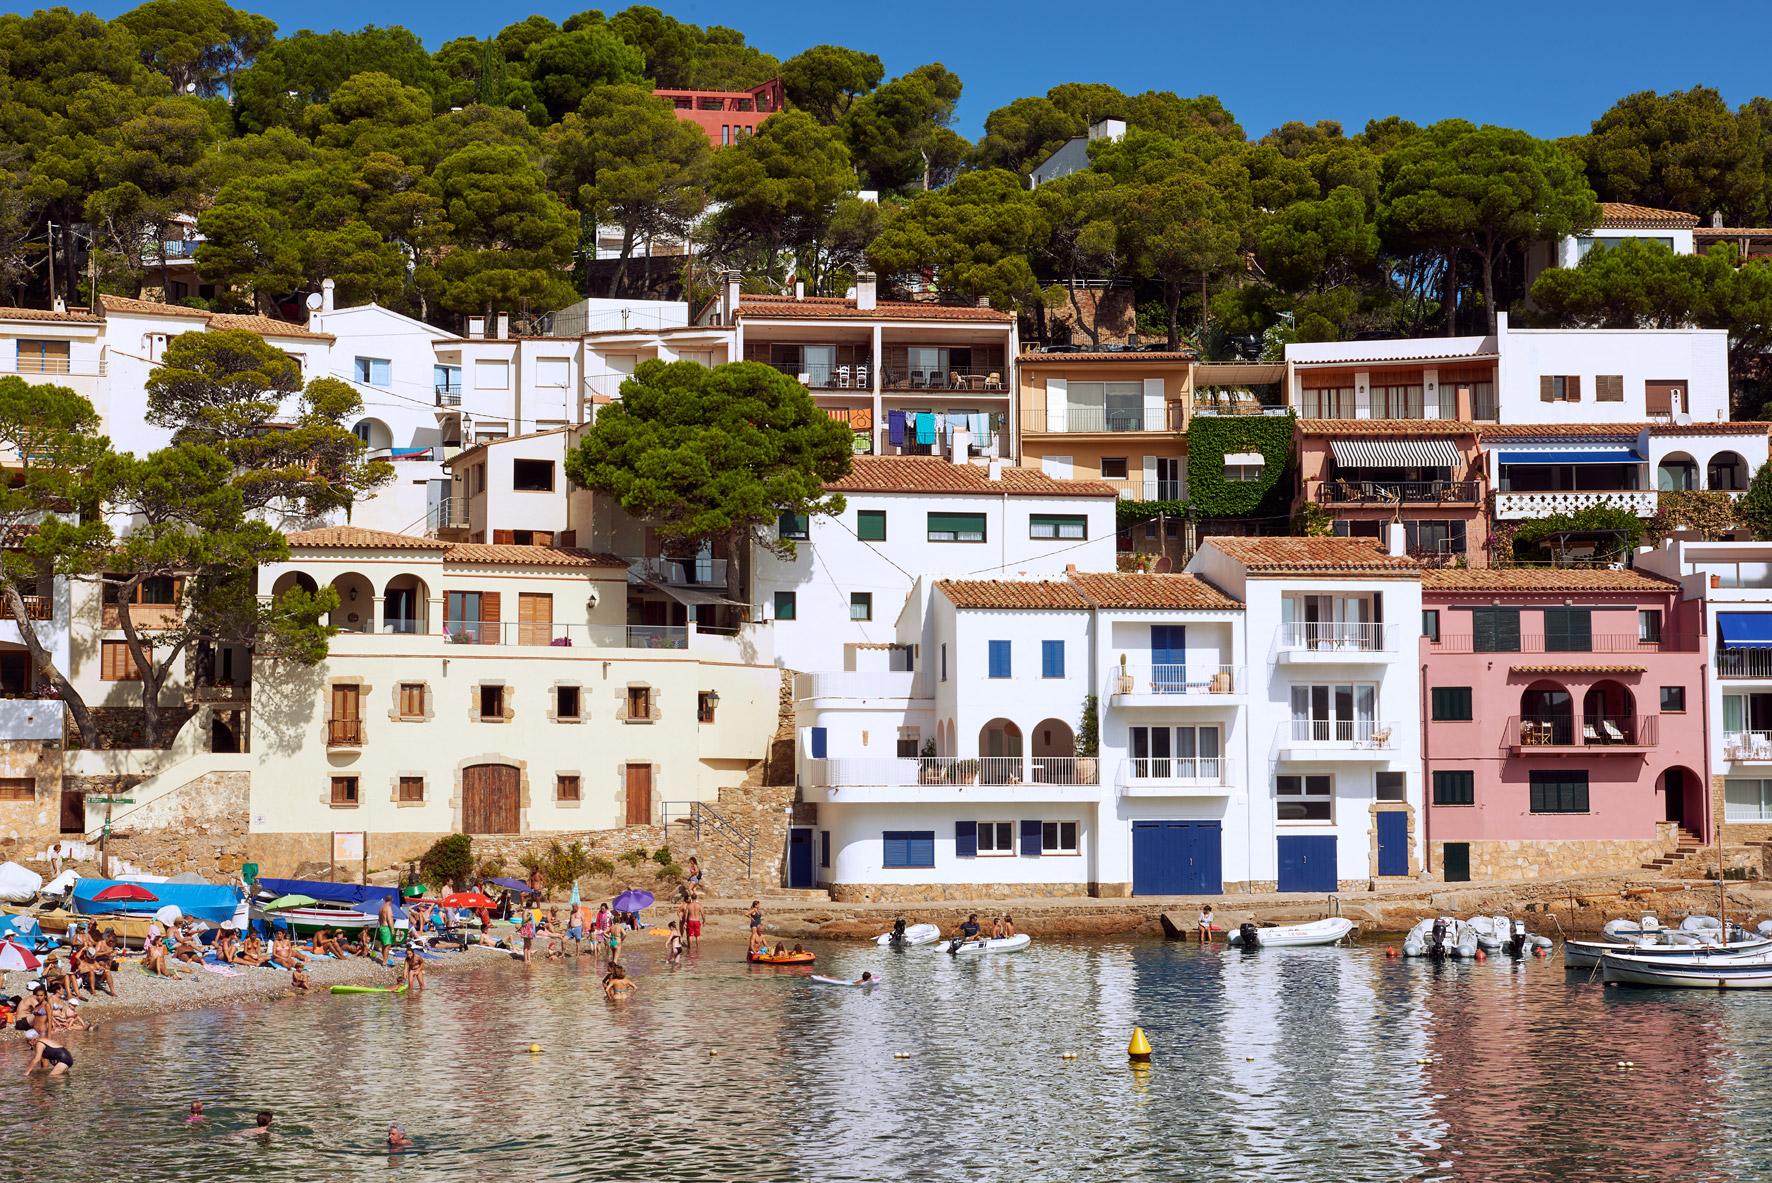 20150830_Travel_Spain-Sa-Tuna-web.jpg